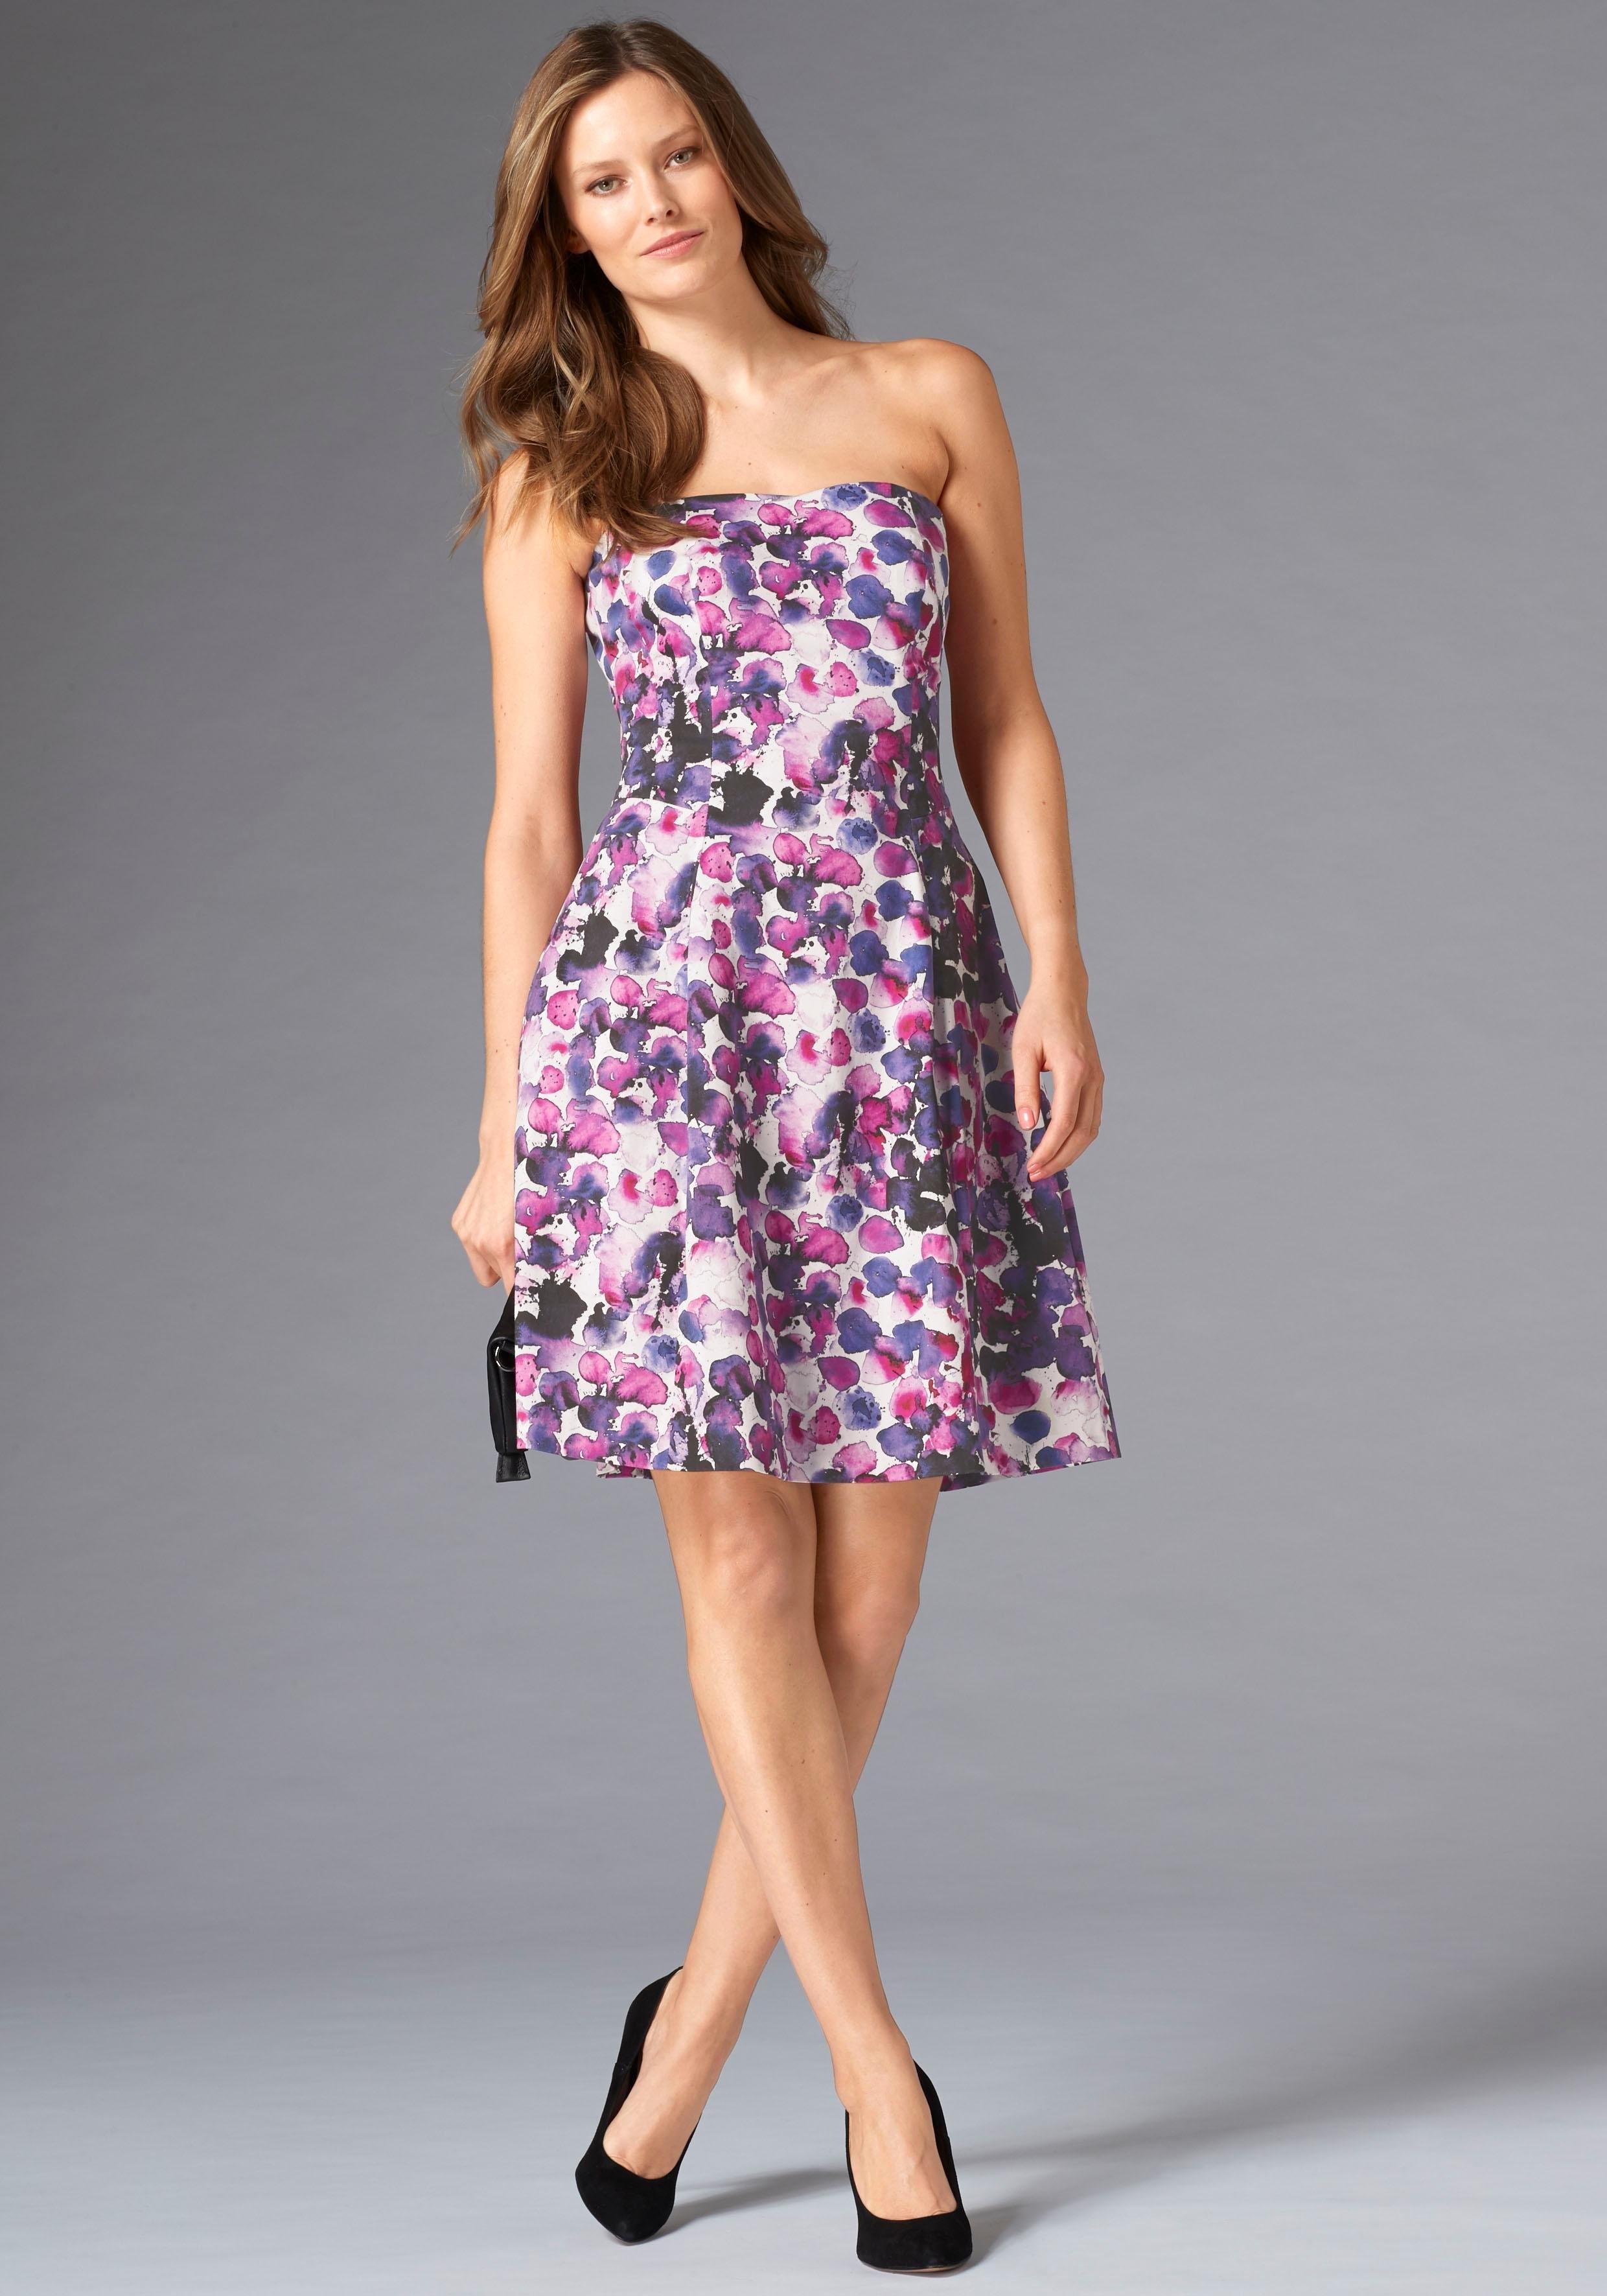 411e707c9acbb1 GUIDO MARIA KRETSCHMER strapless jurk »Sakura« online shoppen